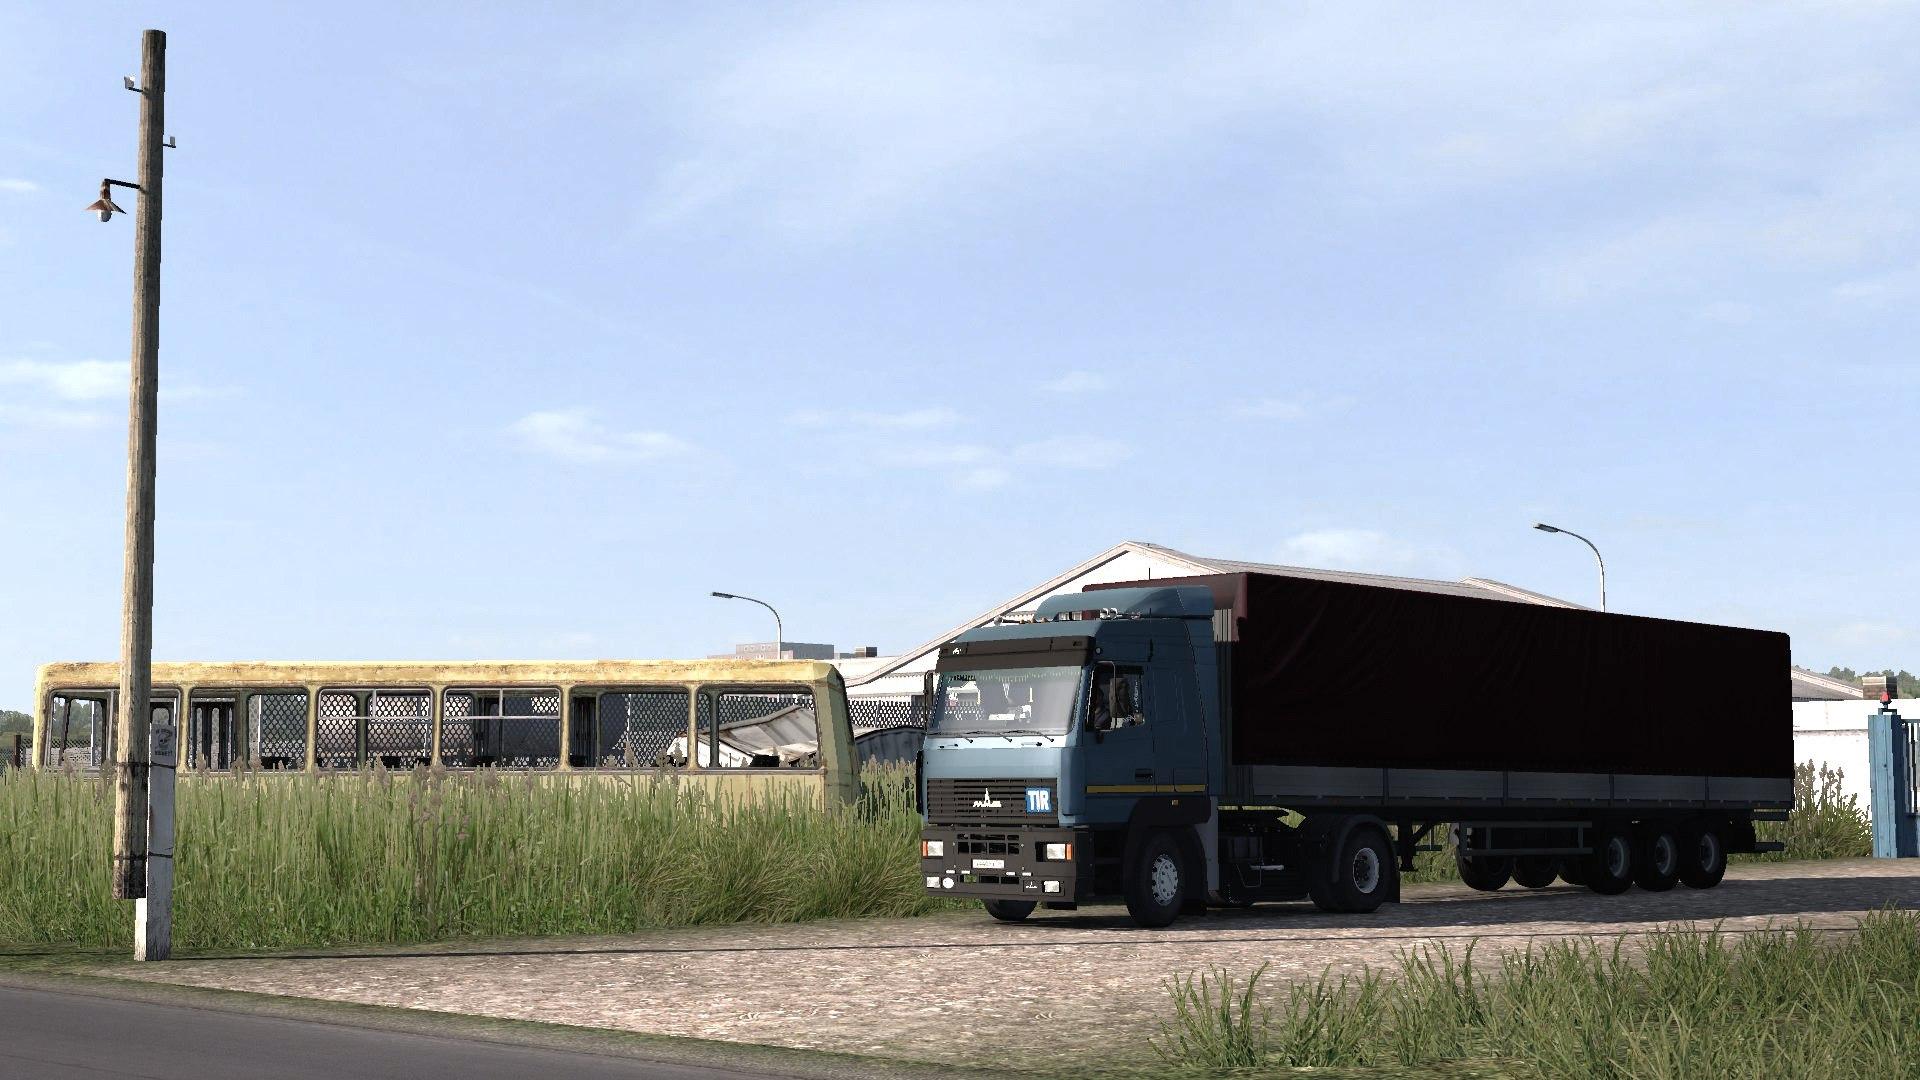 MgOZAbkMDhg.jpg - Euro Truck Simulator 2